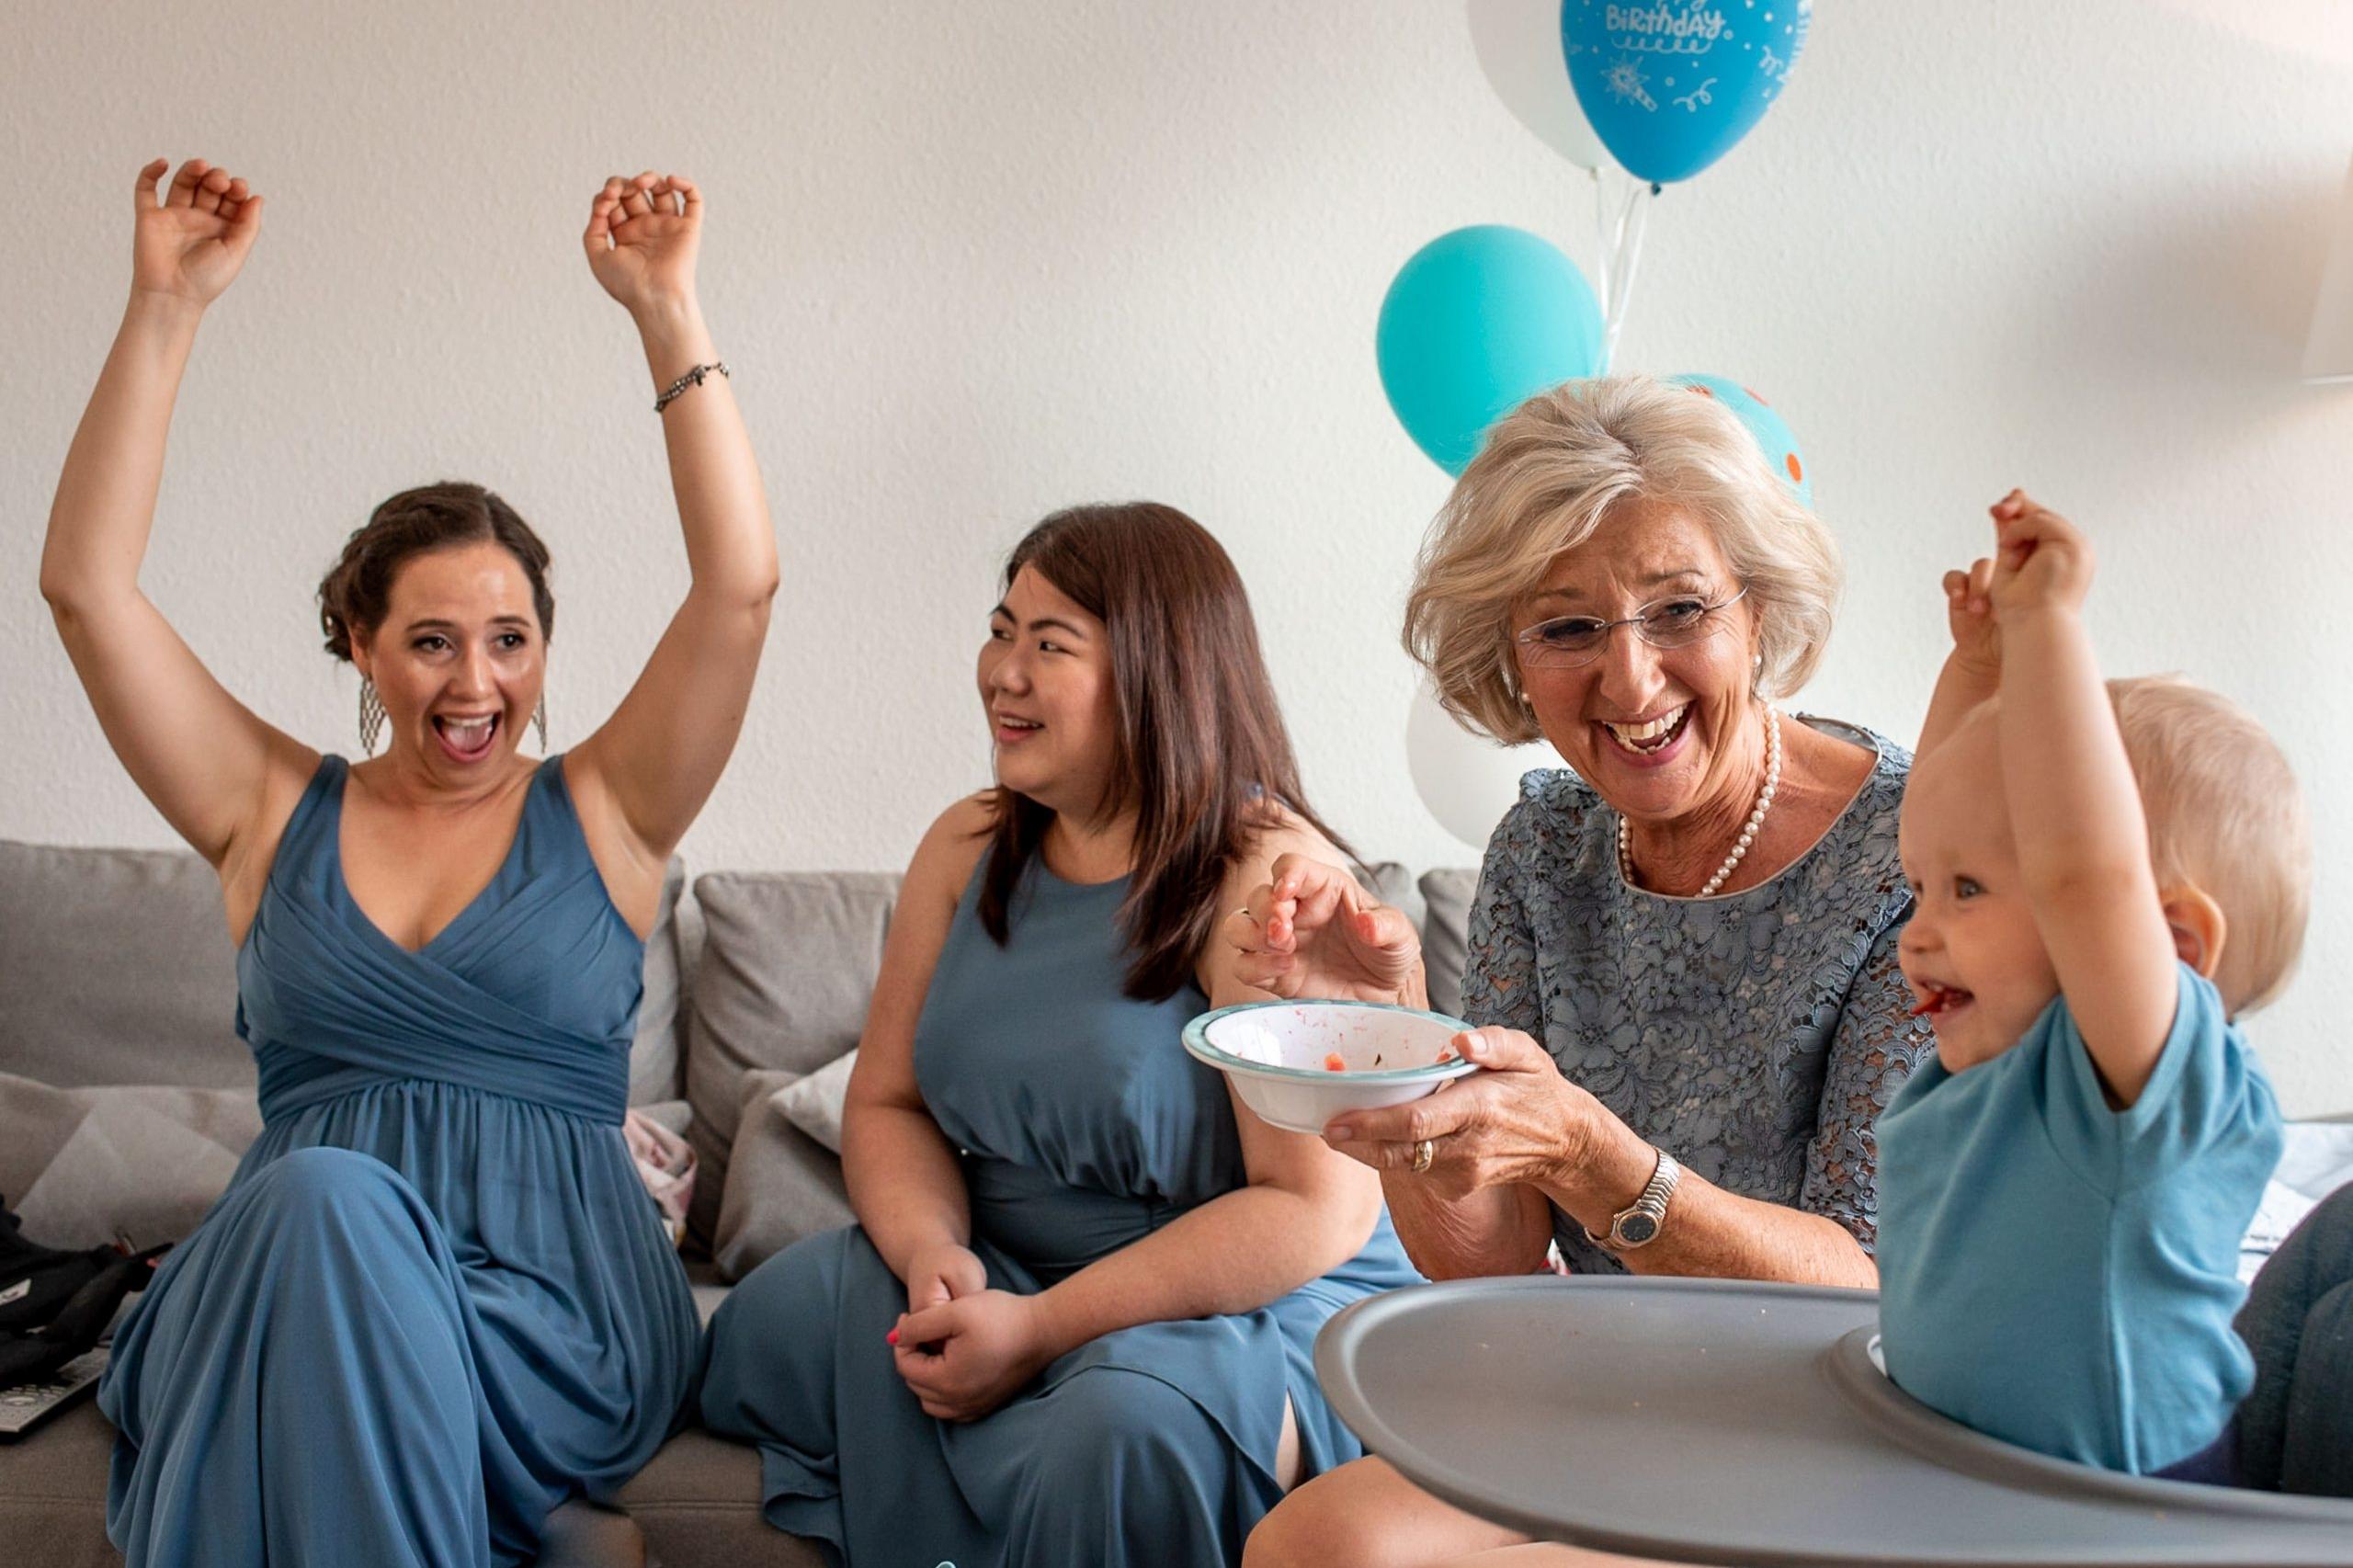 bridesmaids in blue dresses celebrating during bridal prep during the bride's baby at her Düsseldorf Destination wedding